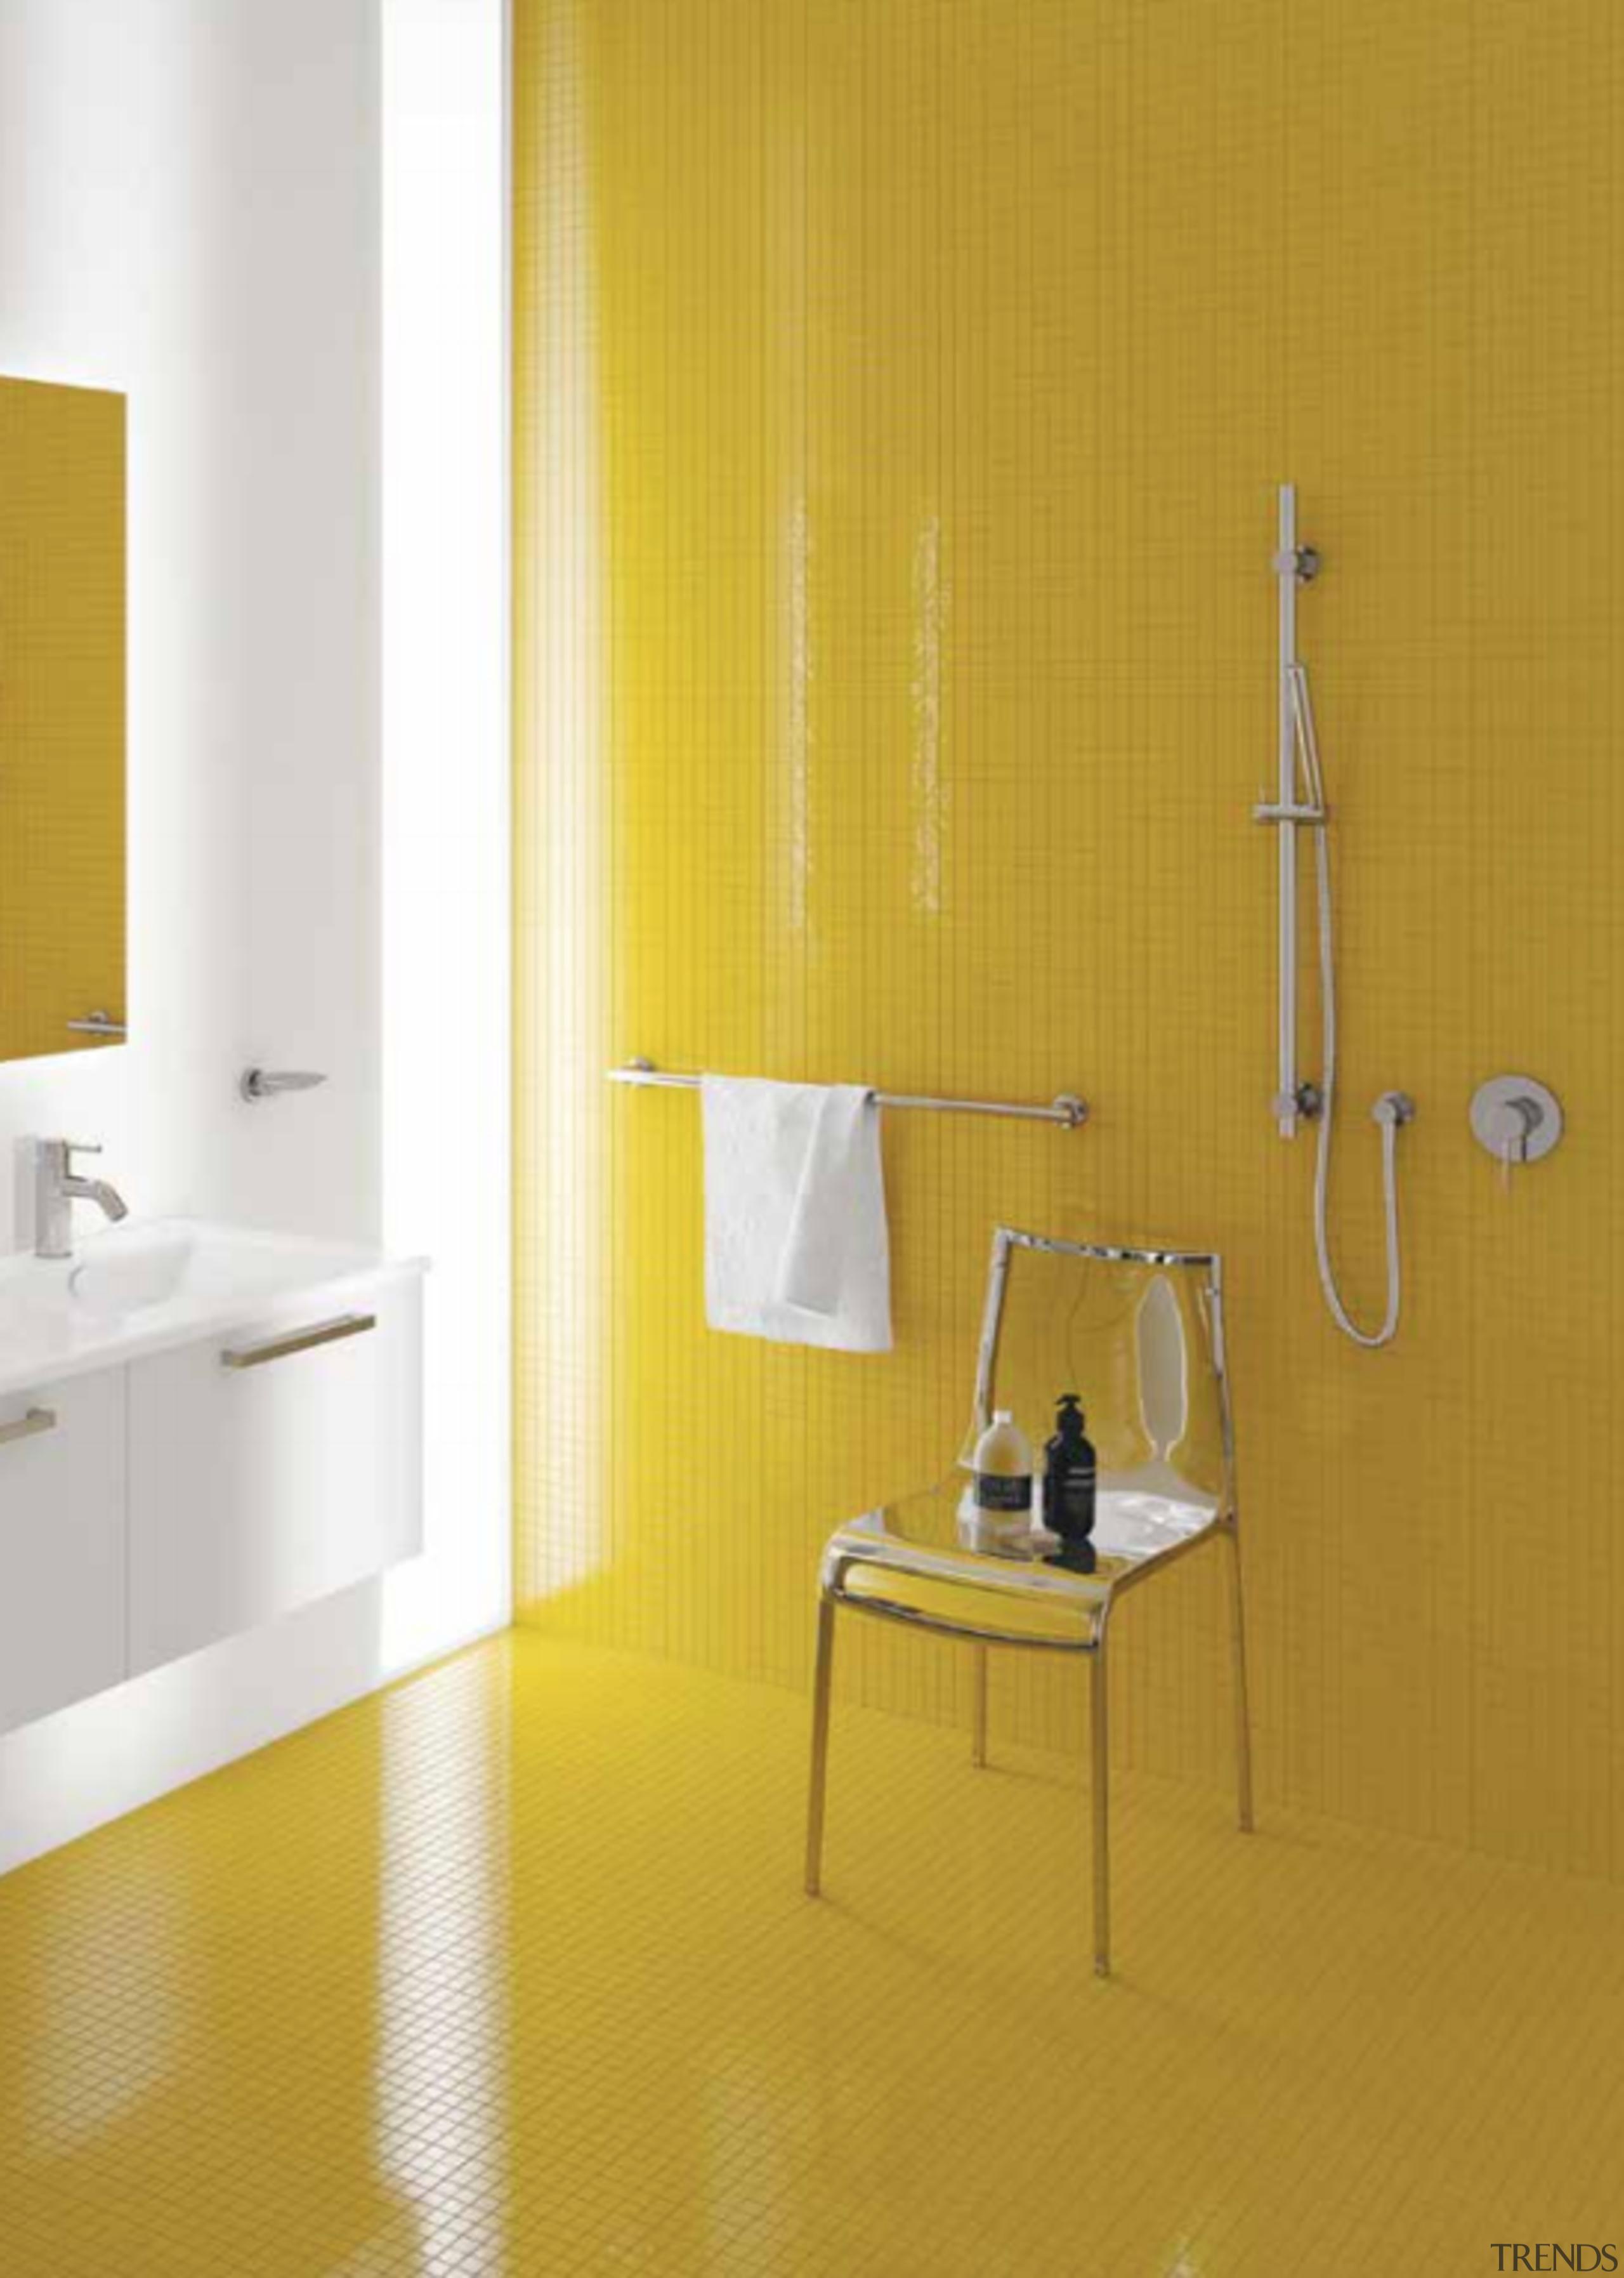 Showered in great ideas - bathroom | floor bathroom, floor, flooring, furniture, interior design, material property, orange, plumbing fixture, room, tile, wall, yellow, orange, white